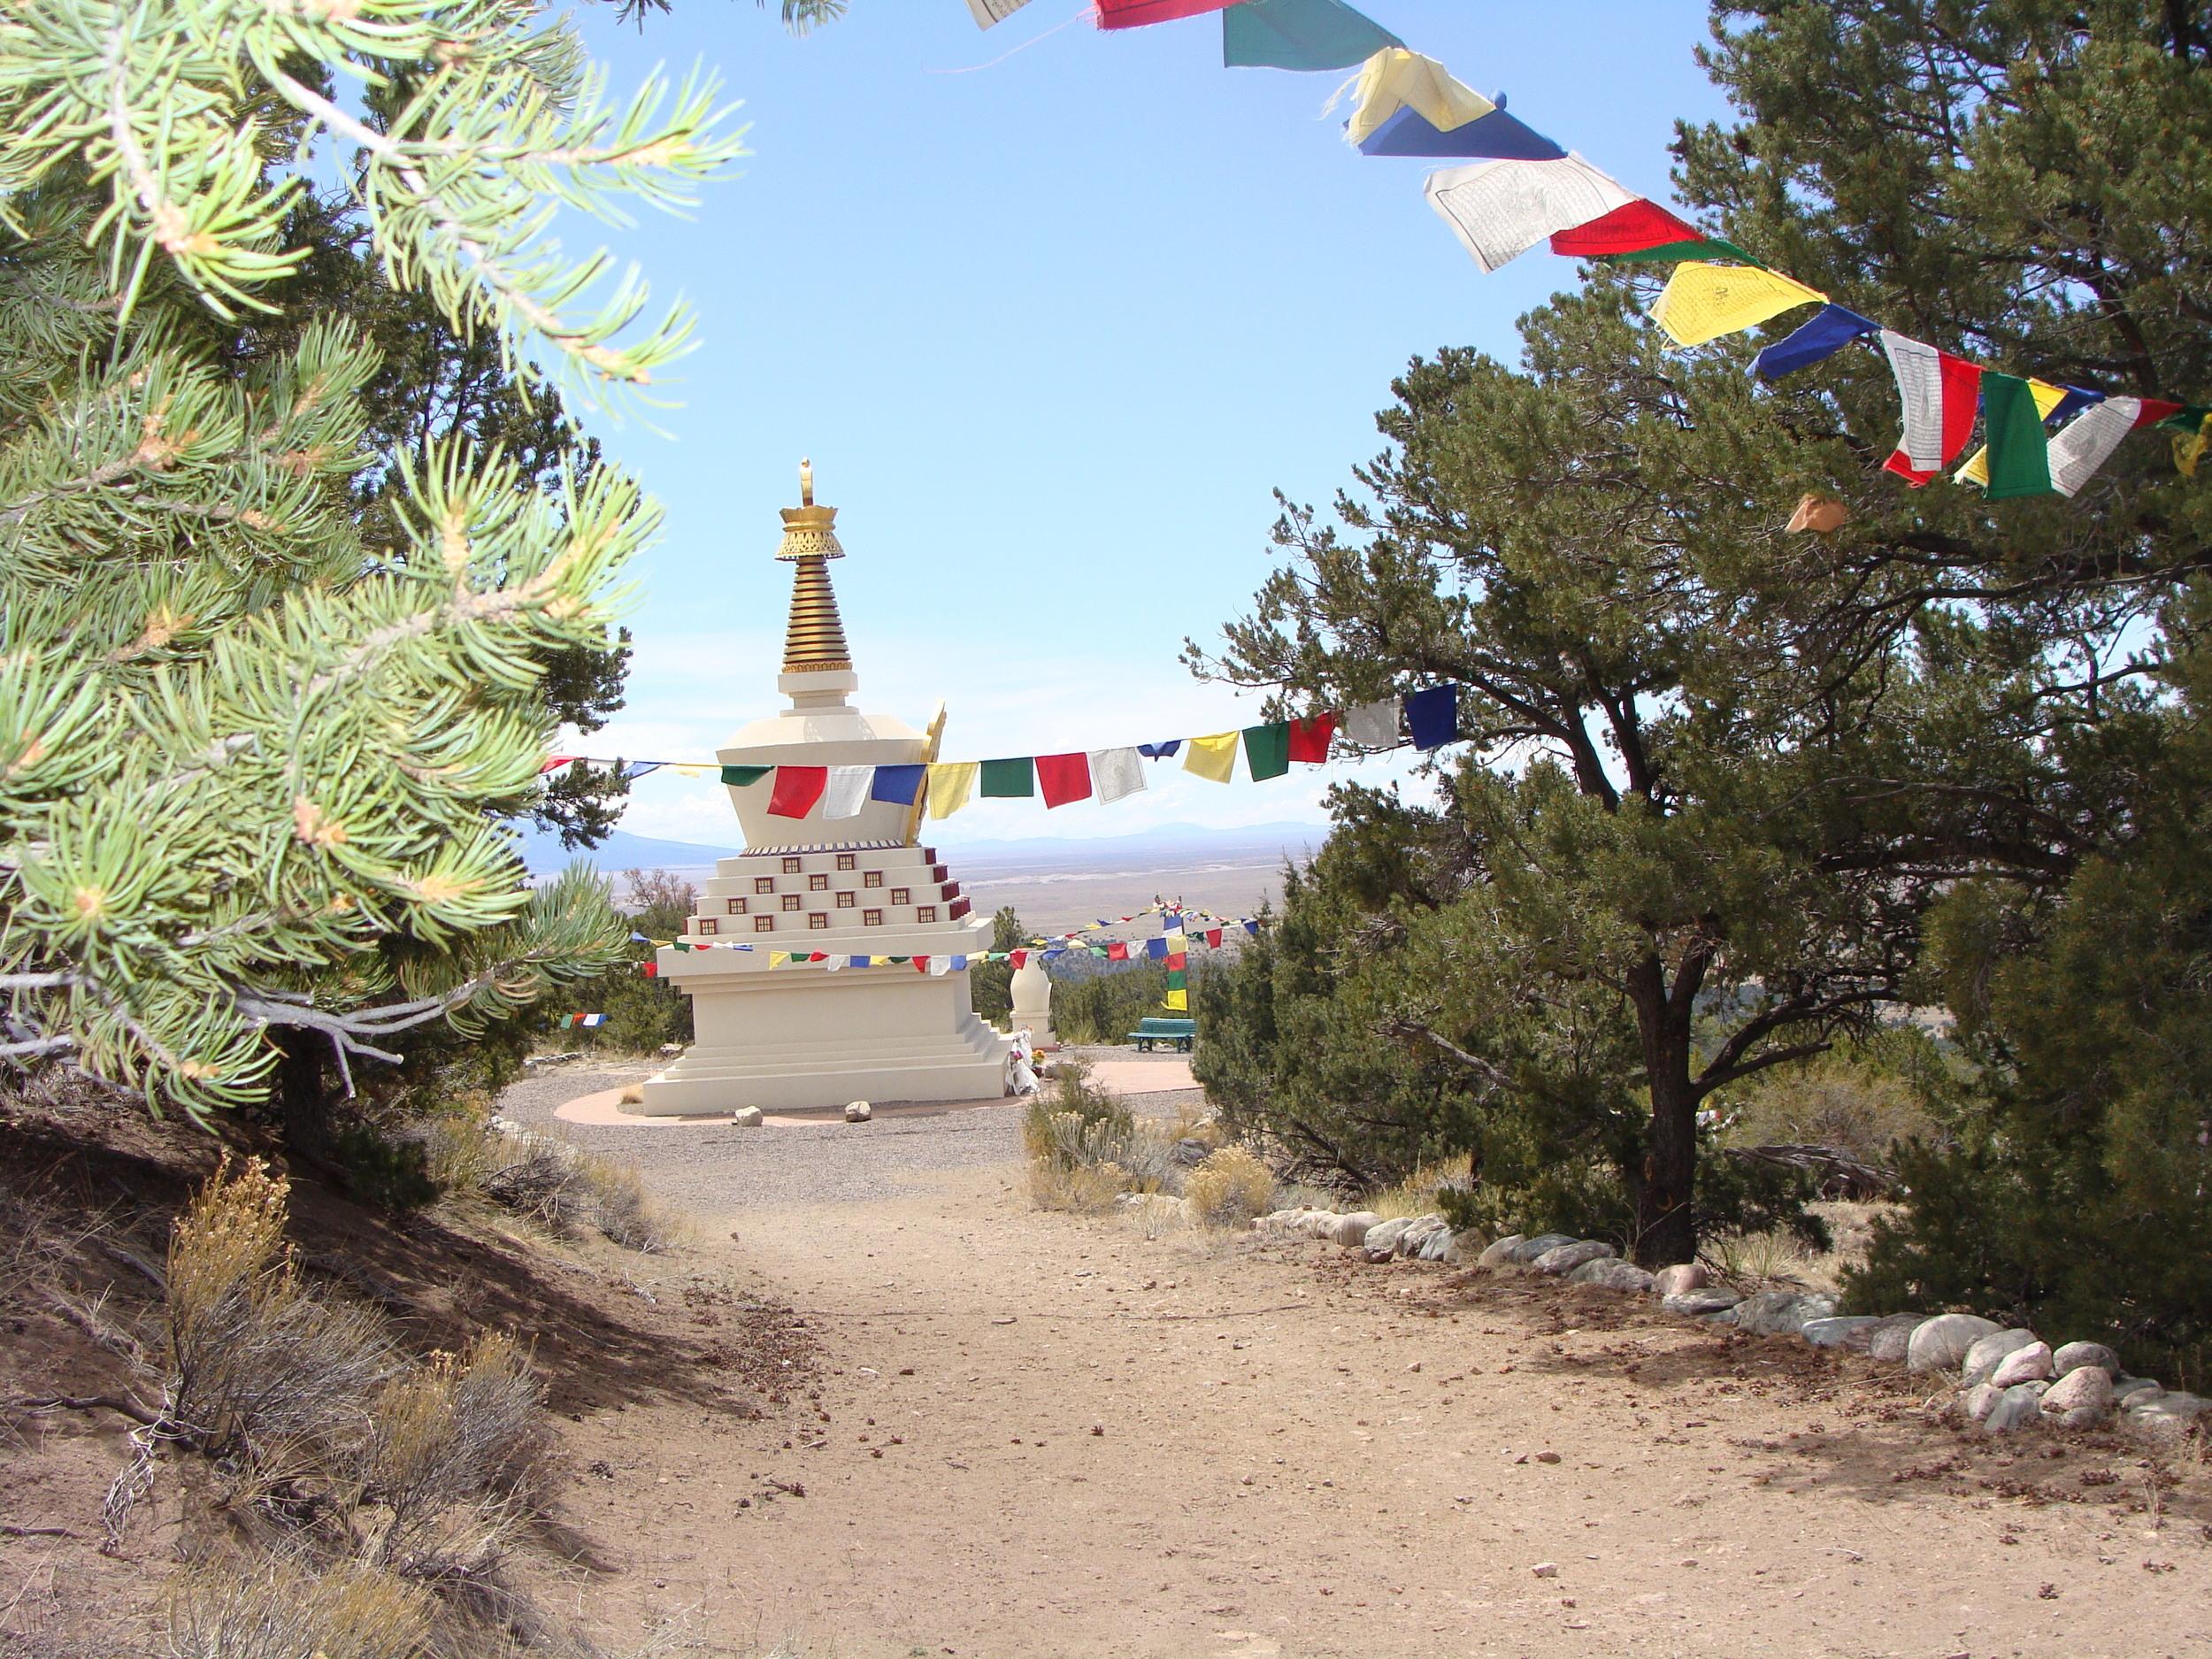 Tashi Gomang Stupa right here in the Sangre de Cristos